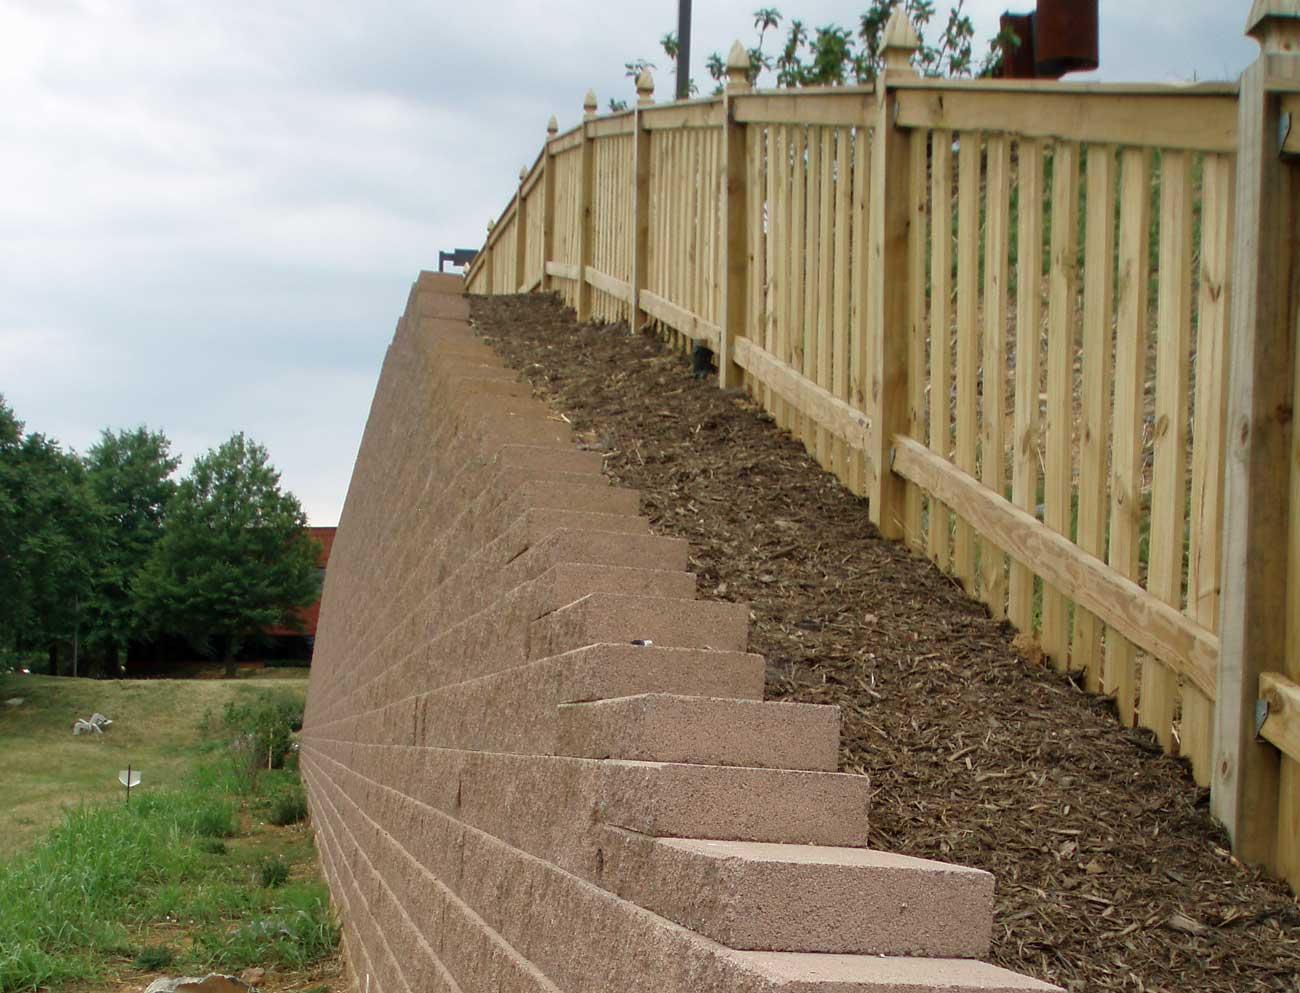 CornerStone Block Retaining Wall Hilton Garden Inn Capping